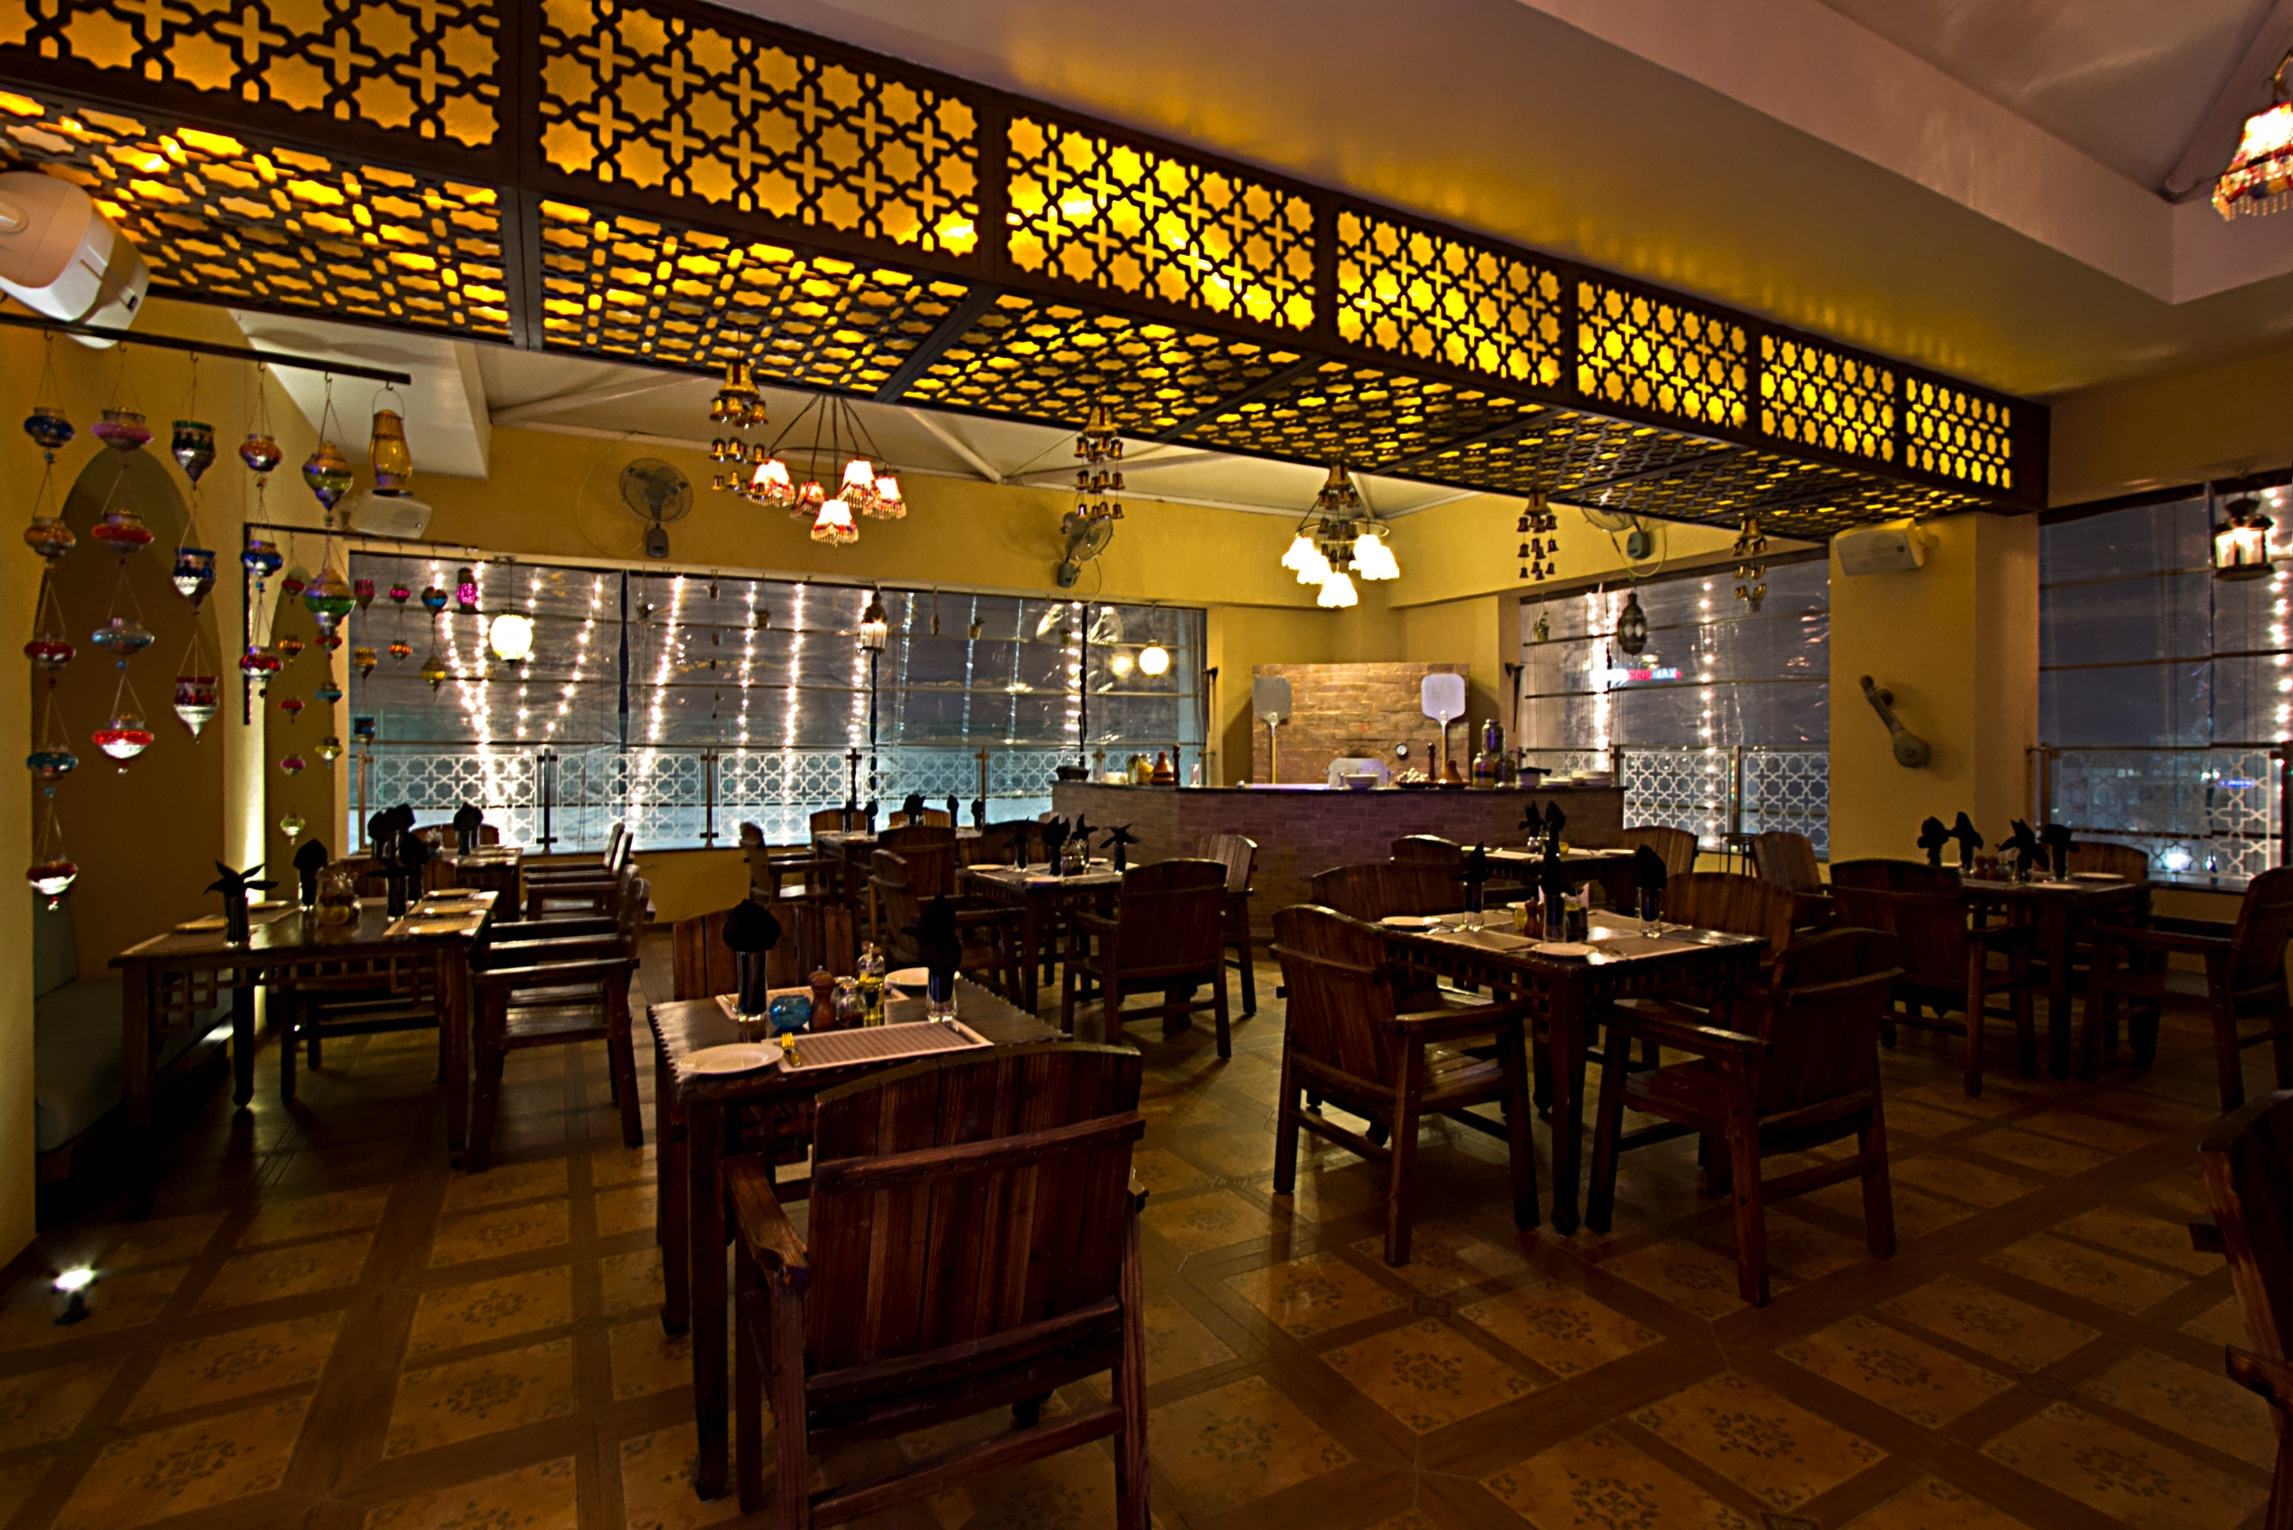 Design of a restaurant by architecture art pvt ltd